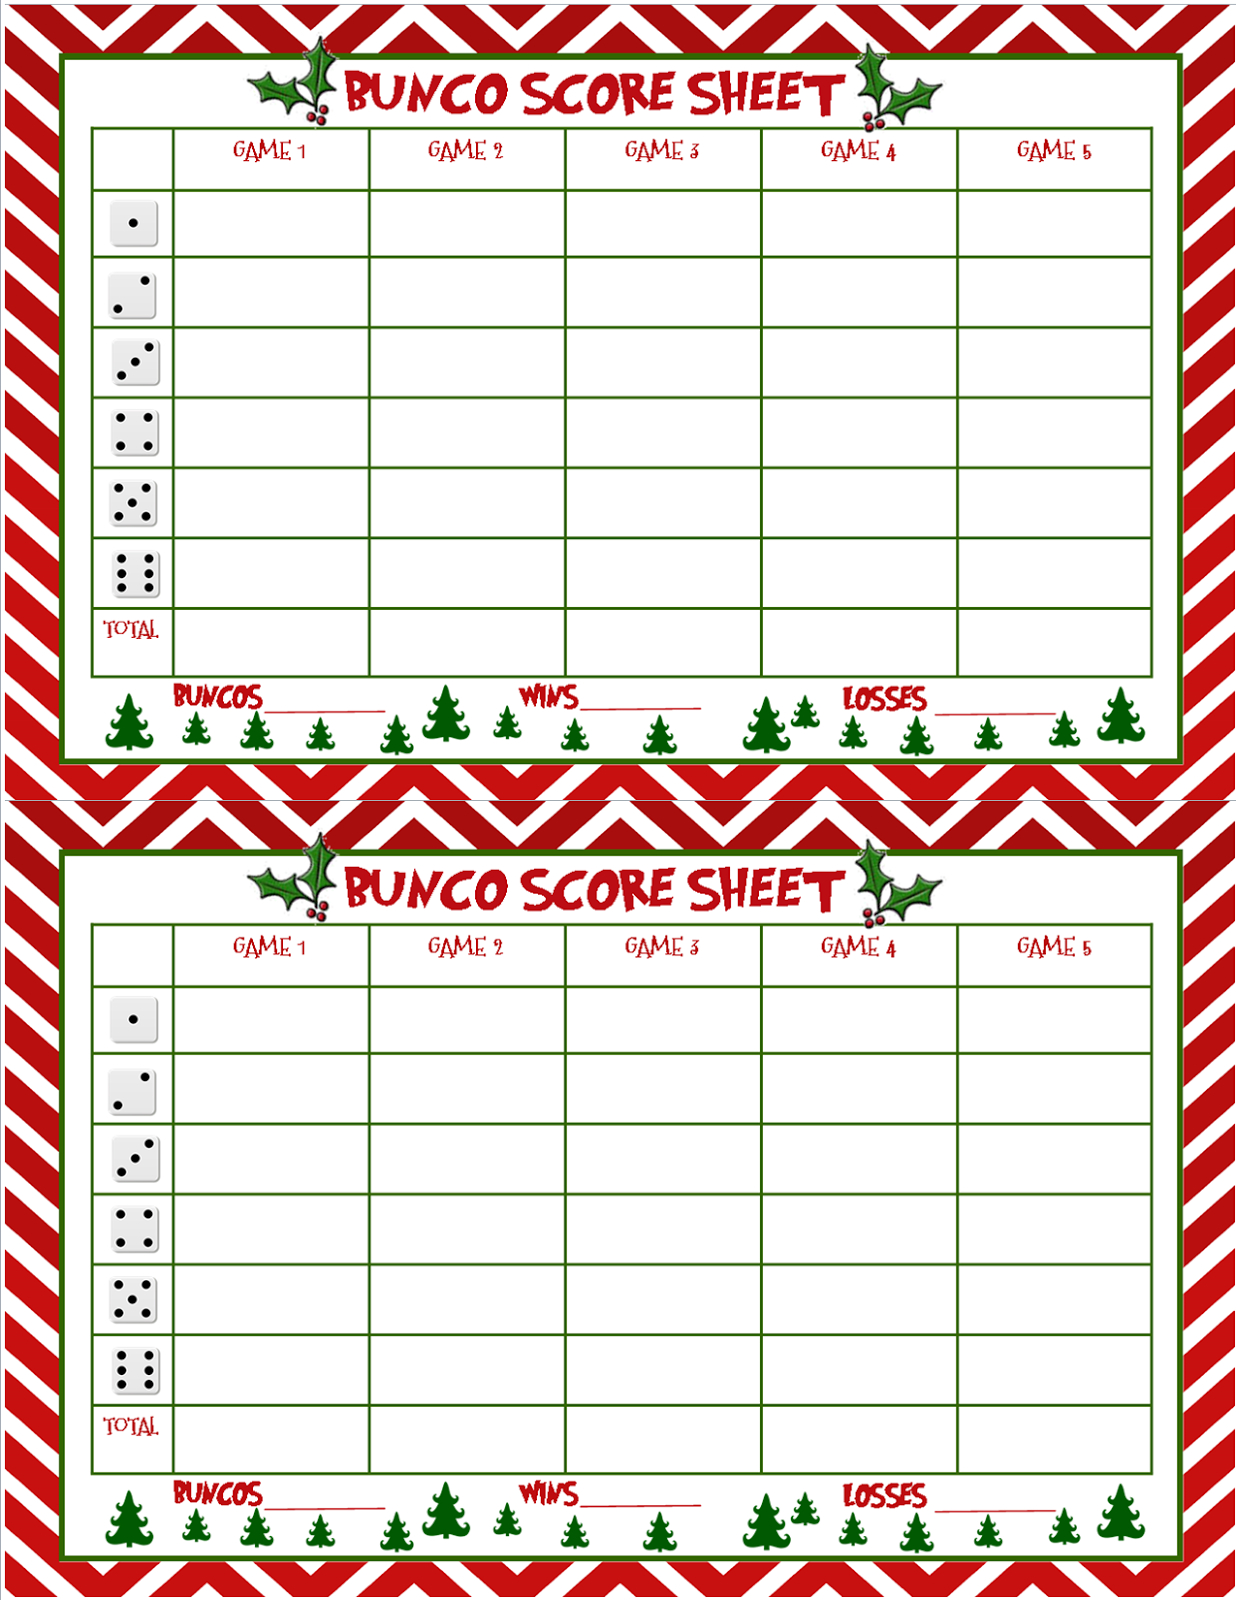 Christmas Bunco Score Sheets Free | Bunco | Bunco Score Sheets - Free Printable Bunco Game Sheets